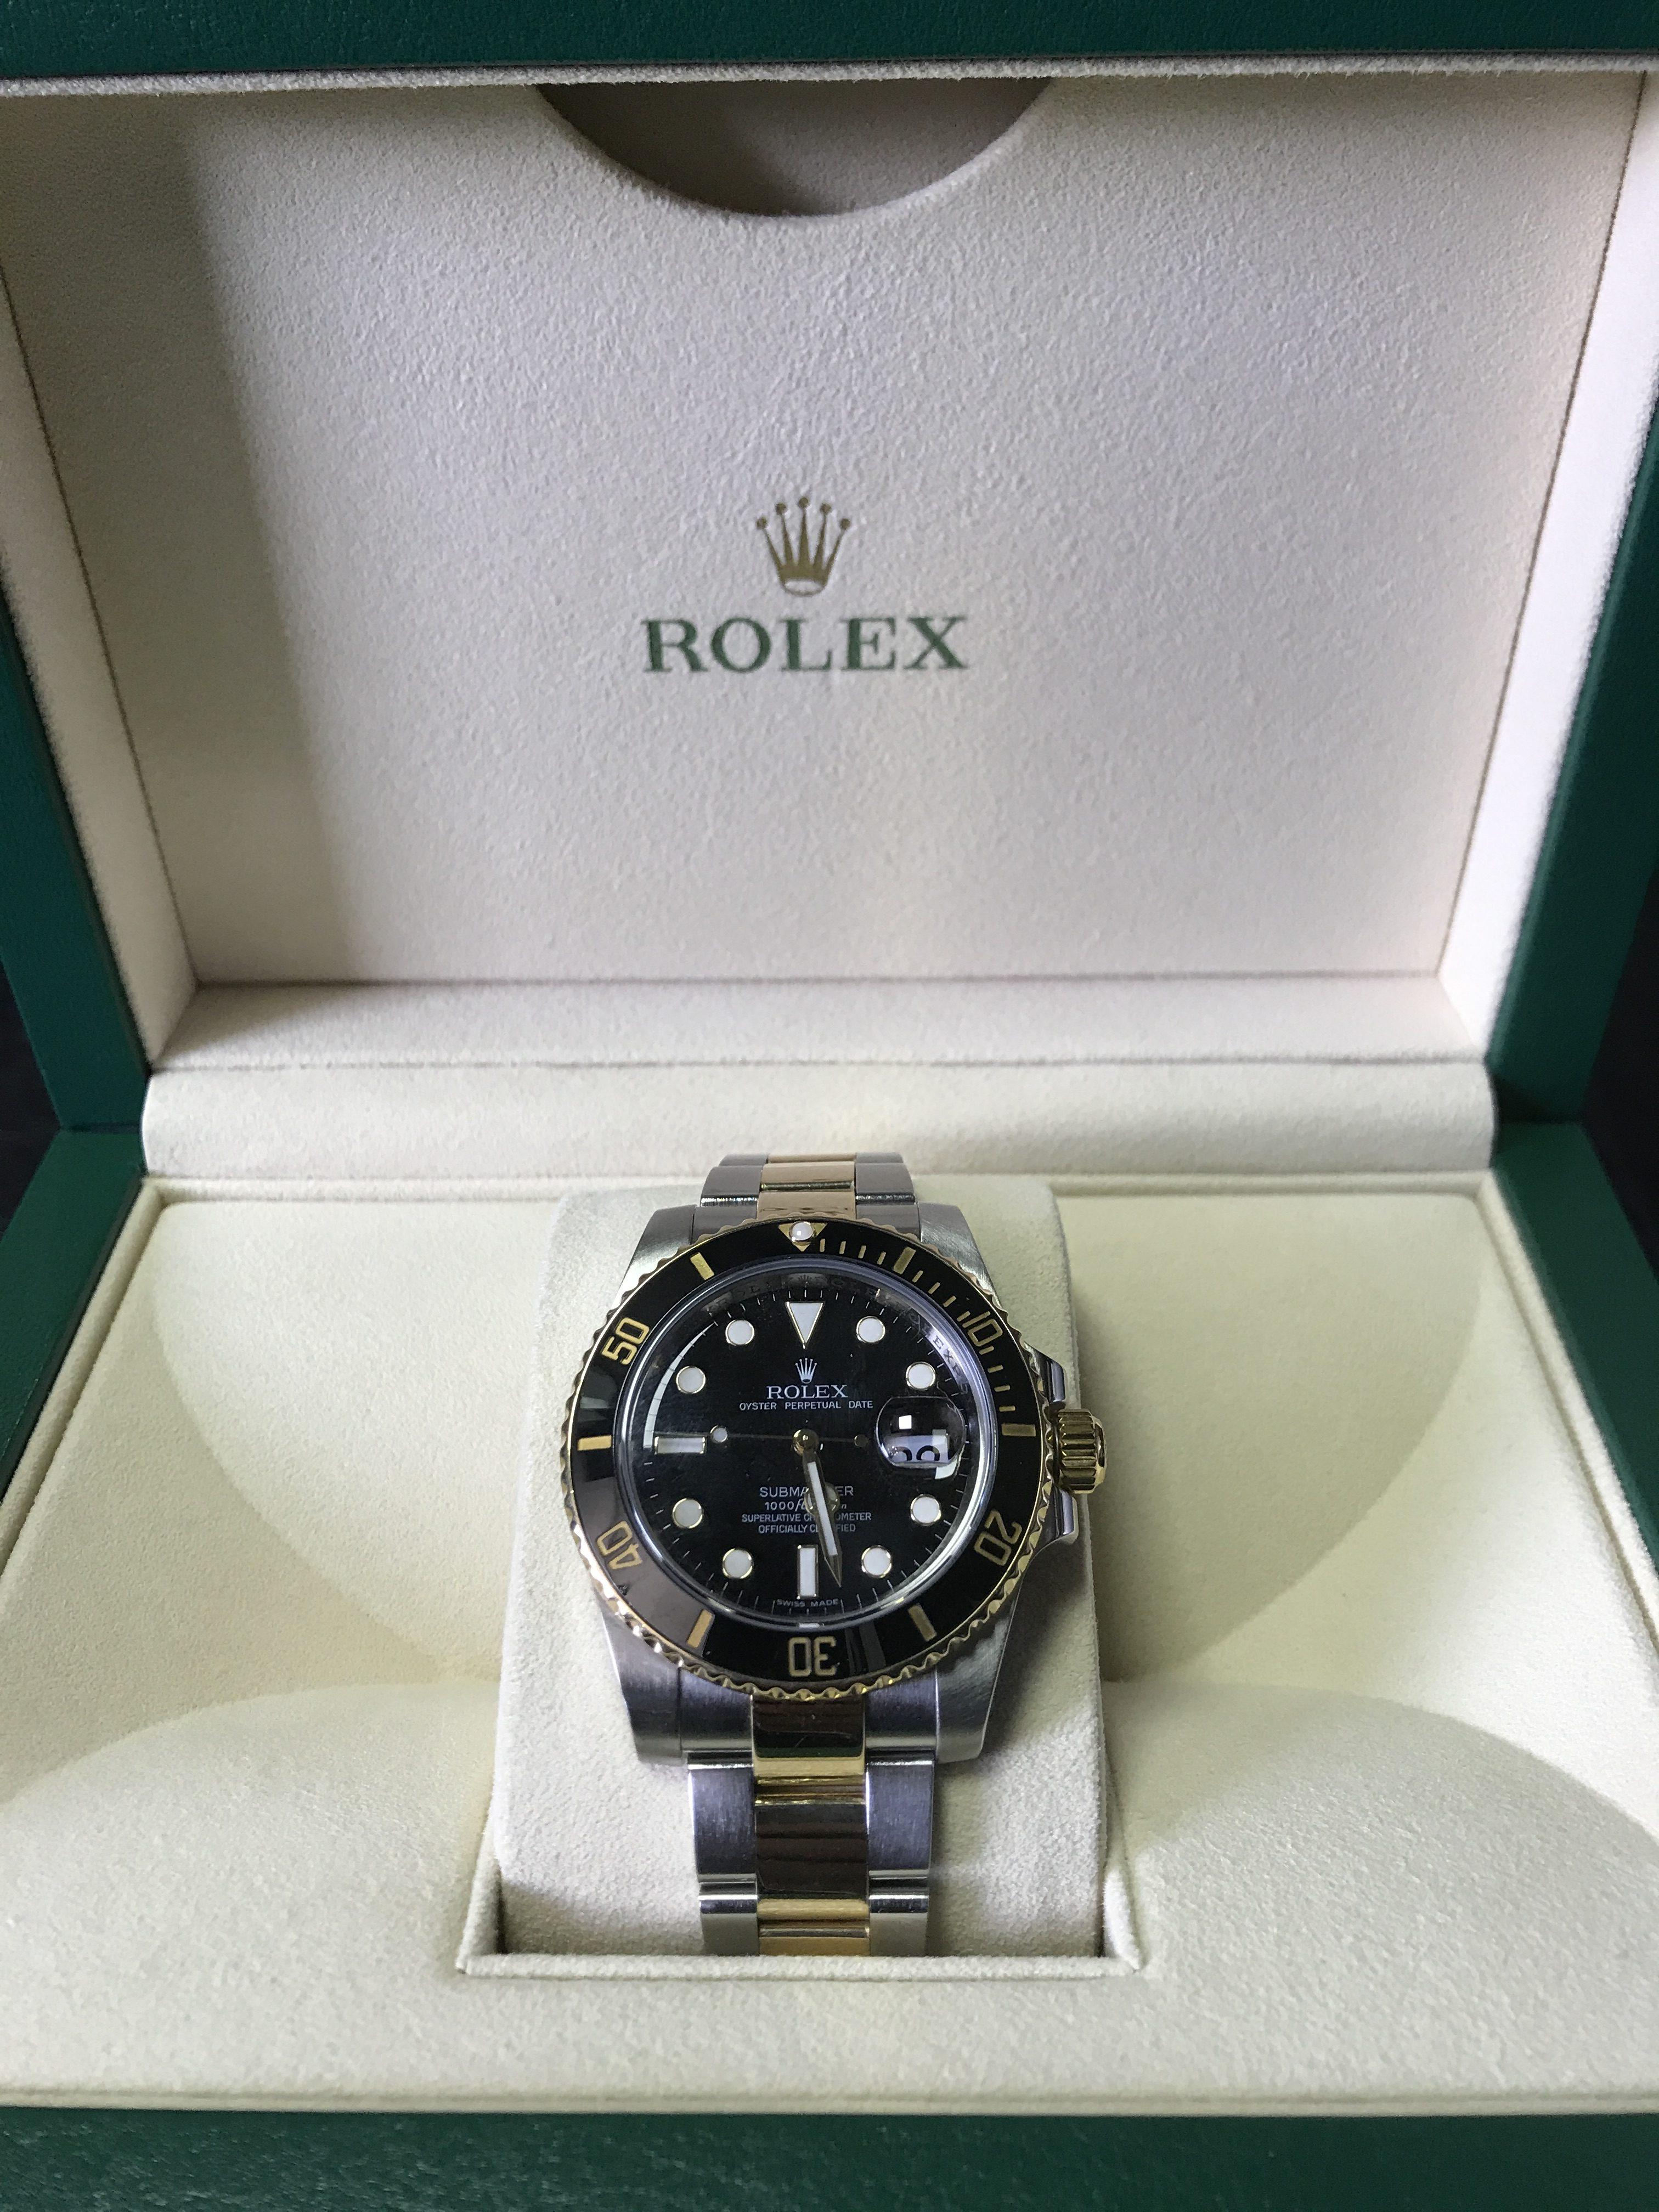 Pre-owned Rolex Submariner Black